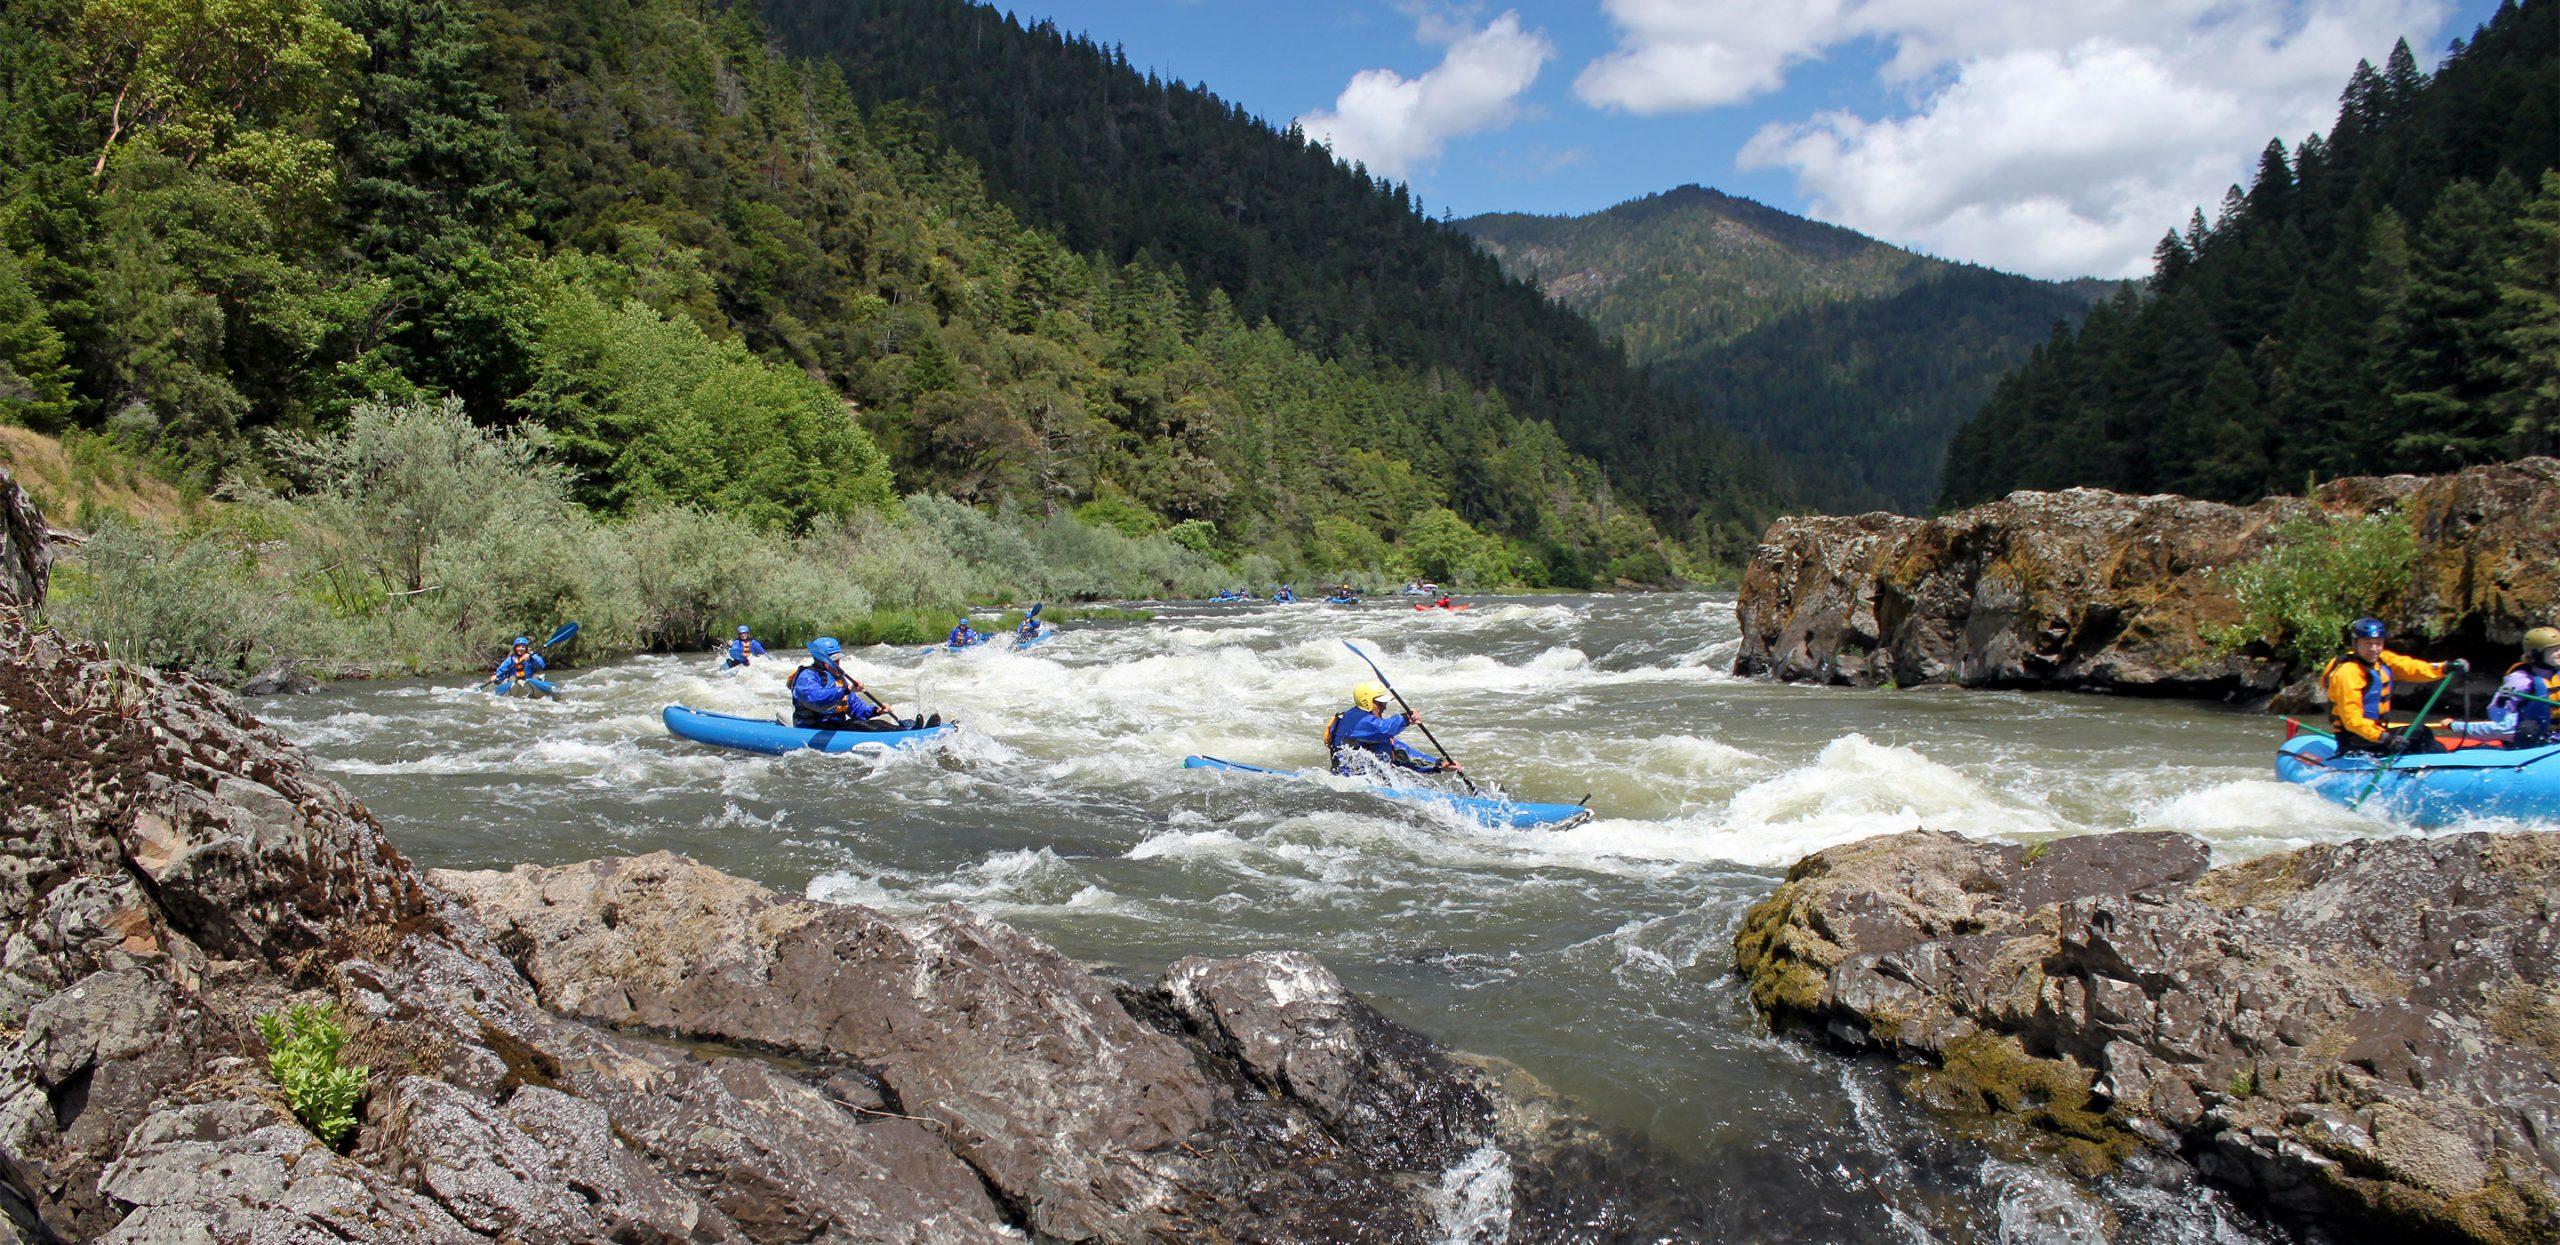 Rogue River Rafting - Oregon Rafting - Rogue High Adventure Kayaking